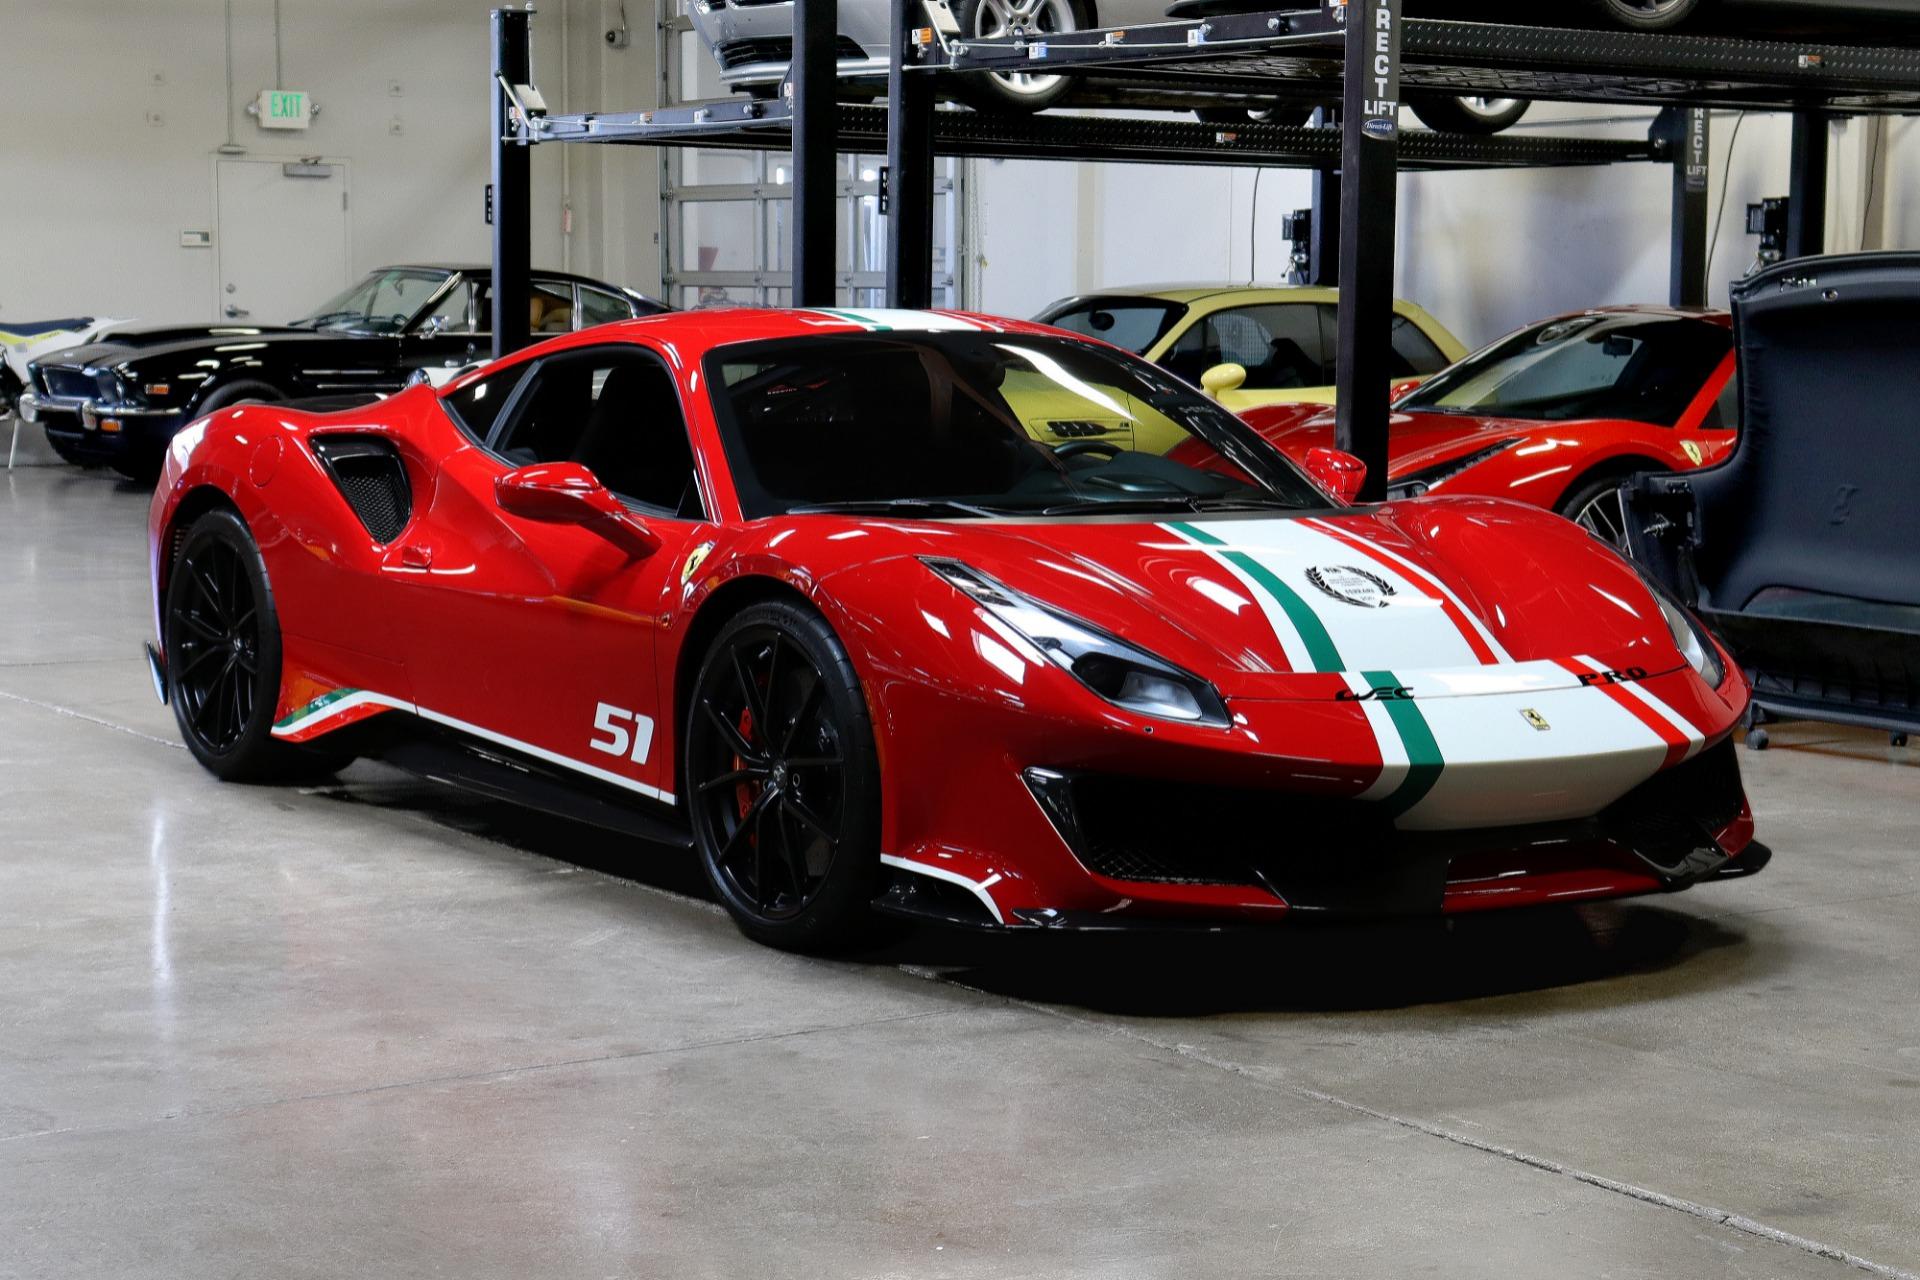 Used 2020 Ferrari 488 Pista Piloti for sale $859,995 at San Francisco Sports Cars in San Carlos CA 94070 1